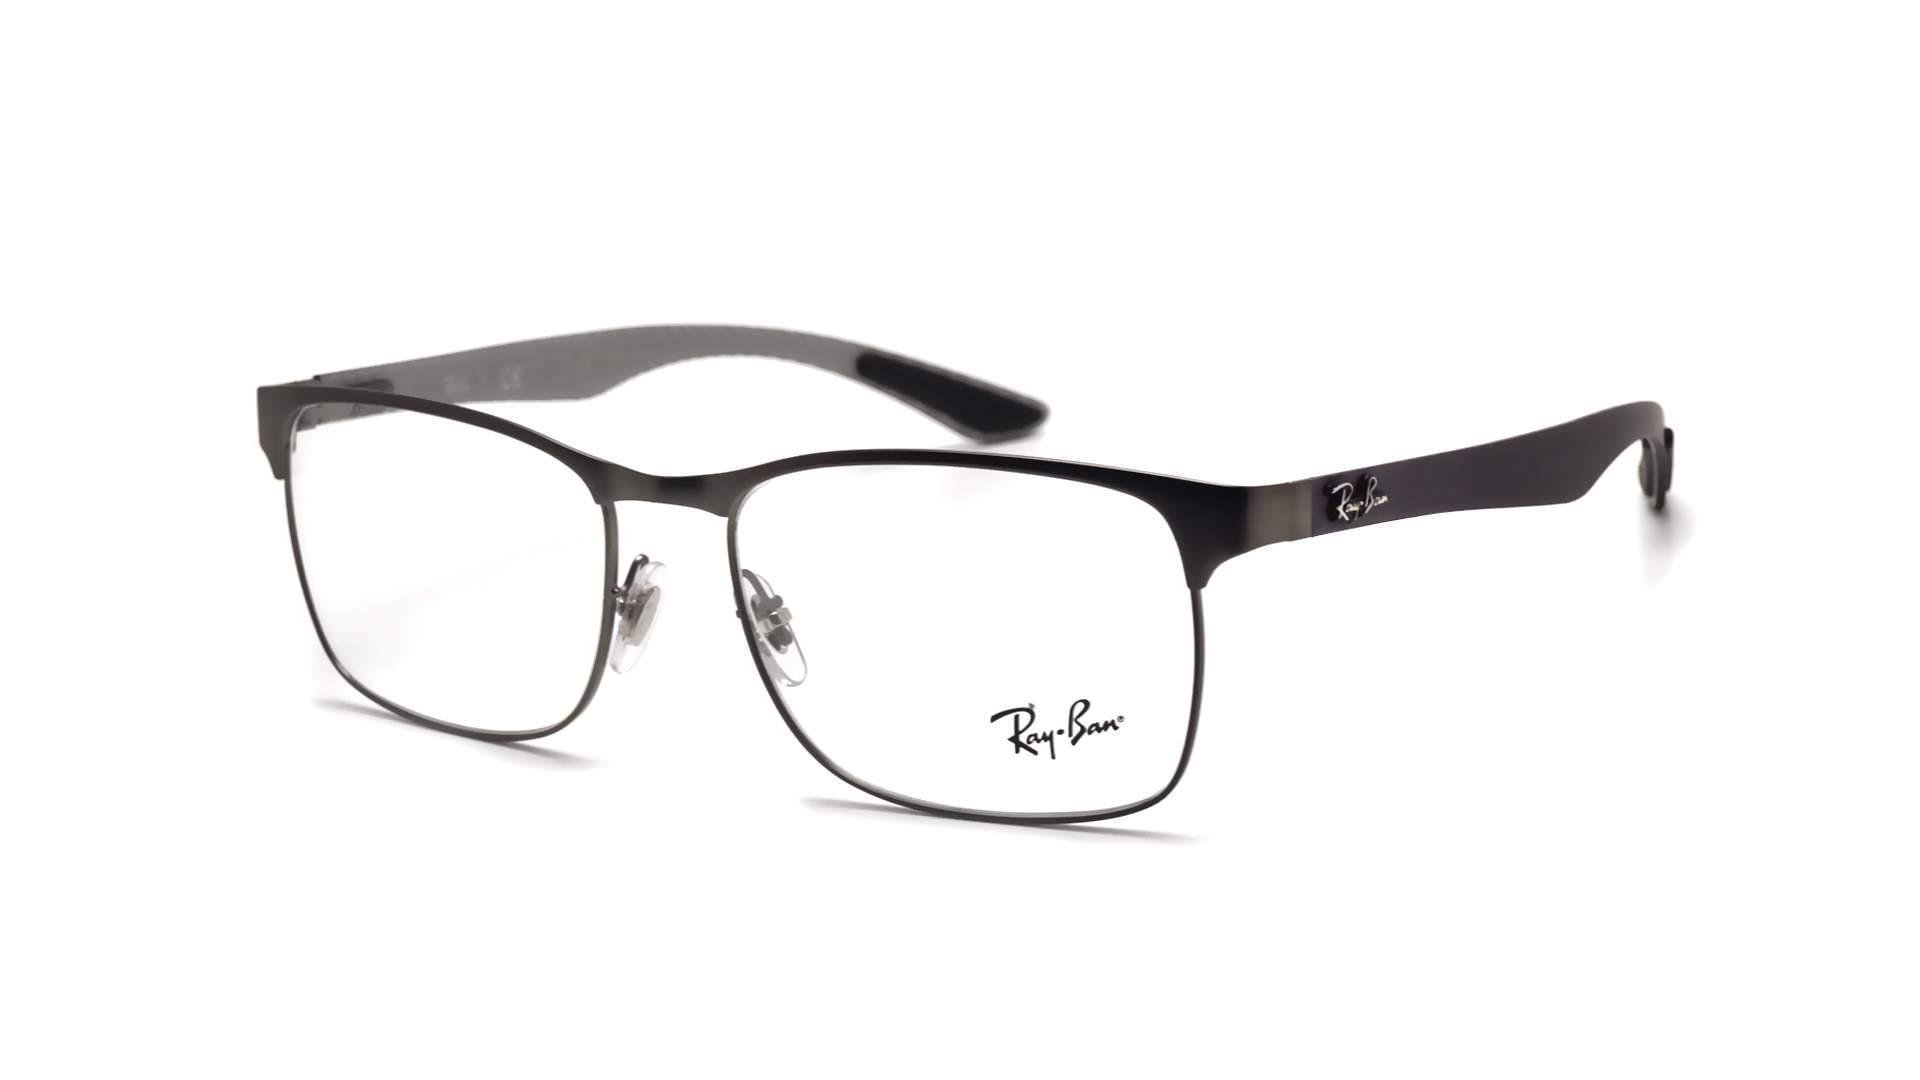 a3aff1820e Eyeglasses Ray-Ban RX8416 RB8416 2620 55-17 Grey Matte Medium